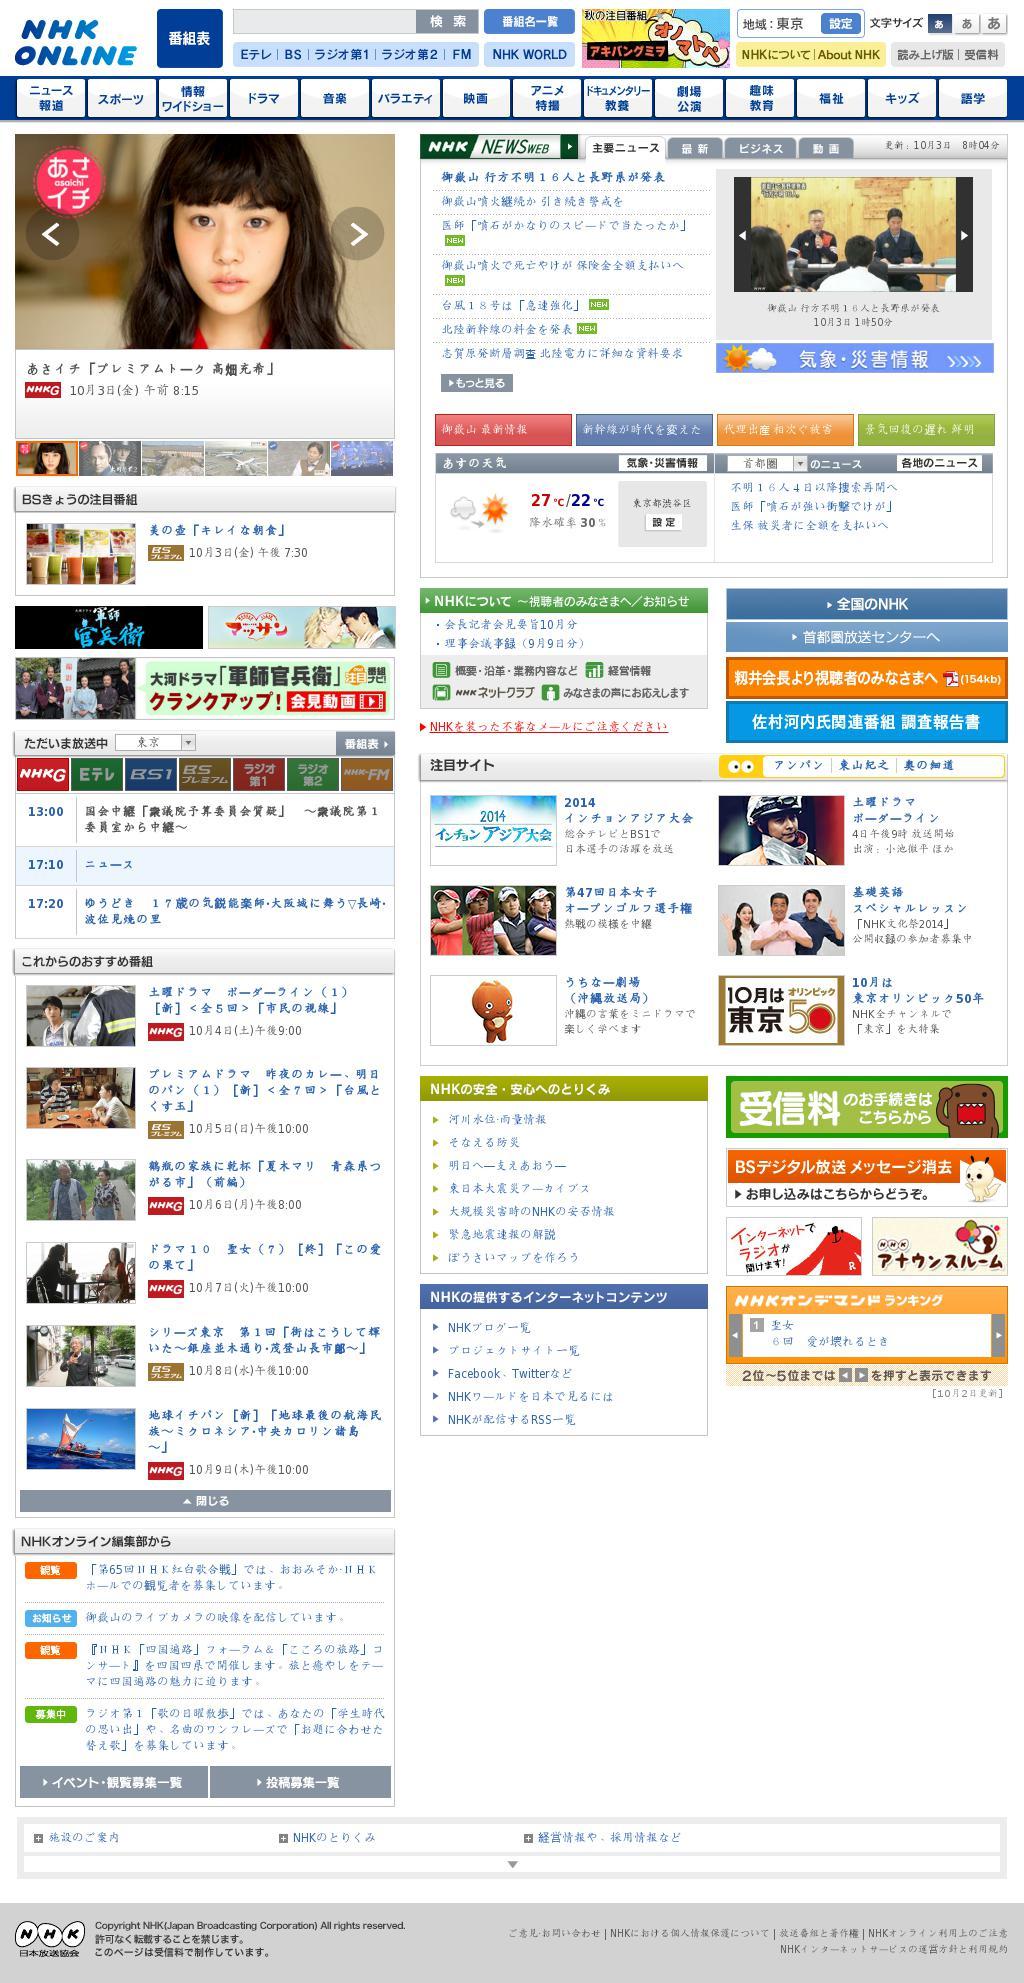 NHK Online at Friday Oct. 3, 2014, 8:10 a.m. UTC